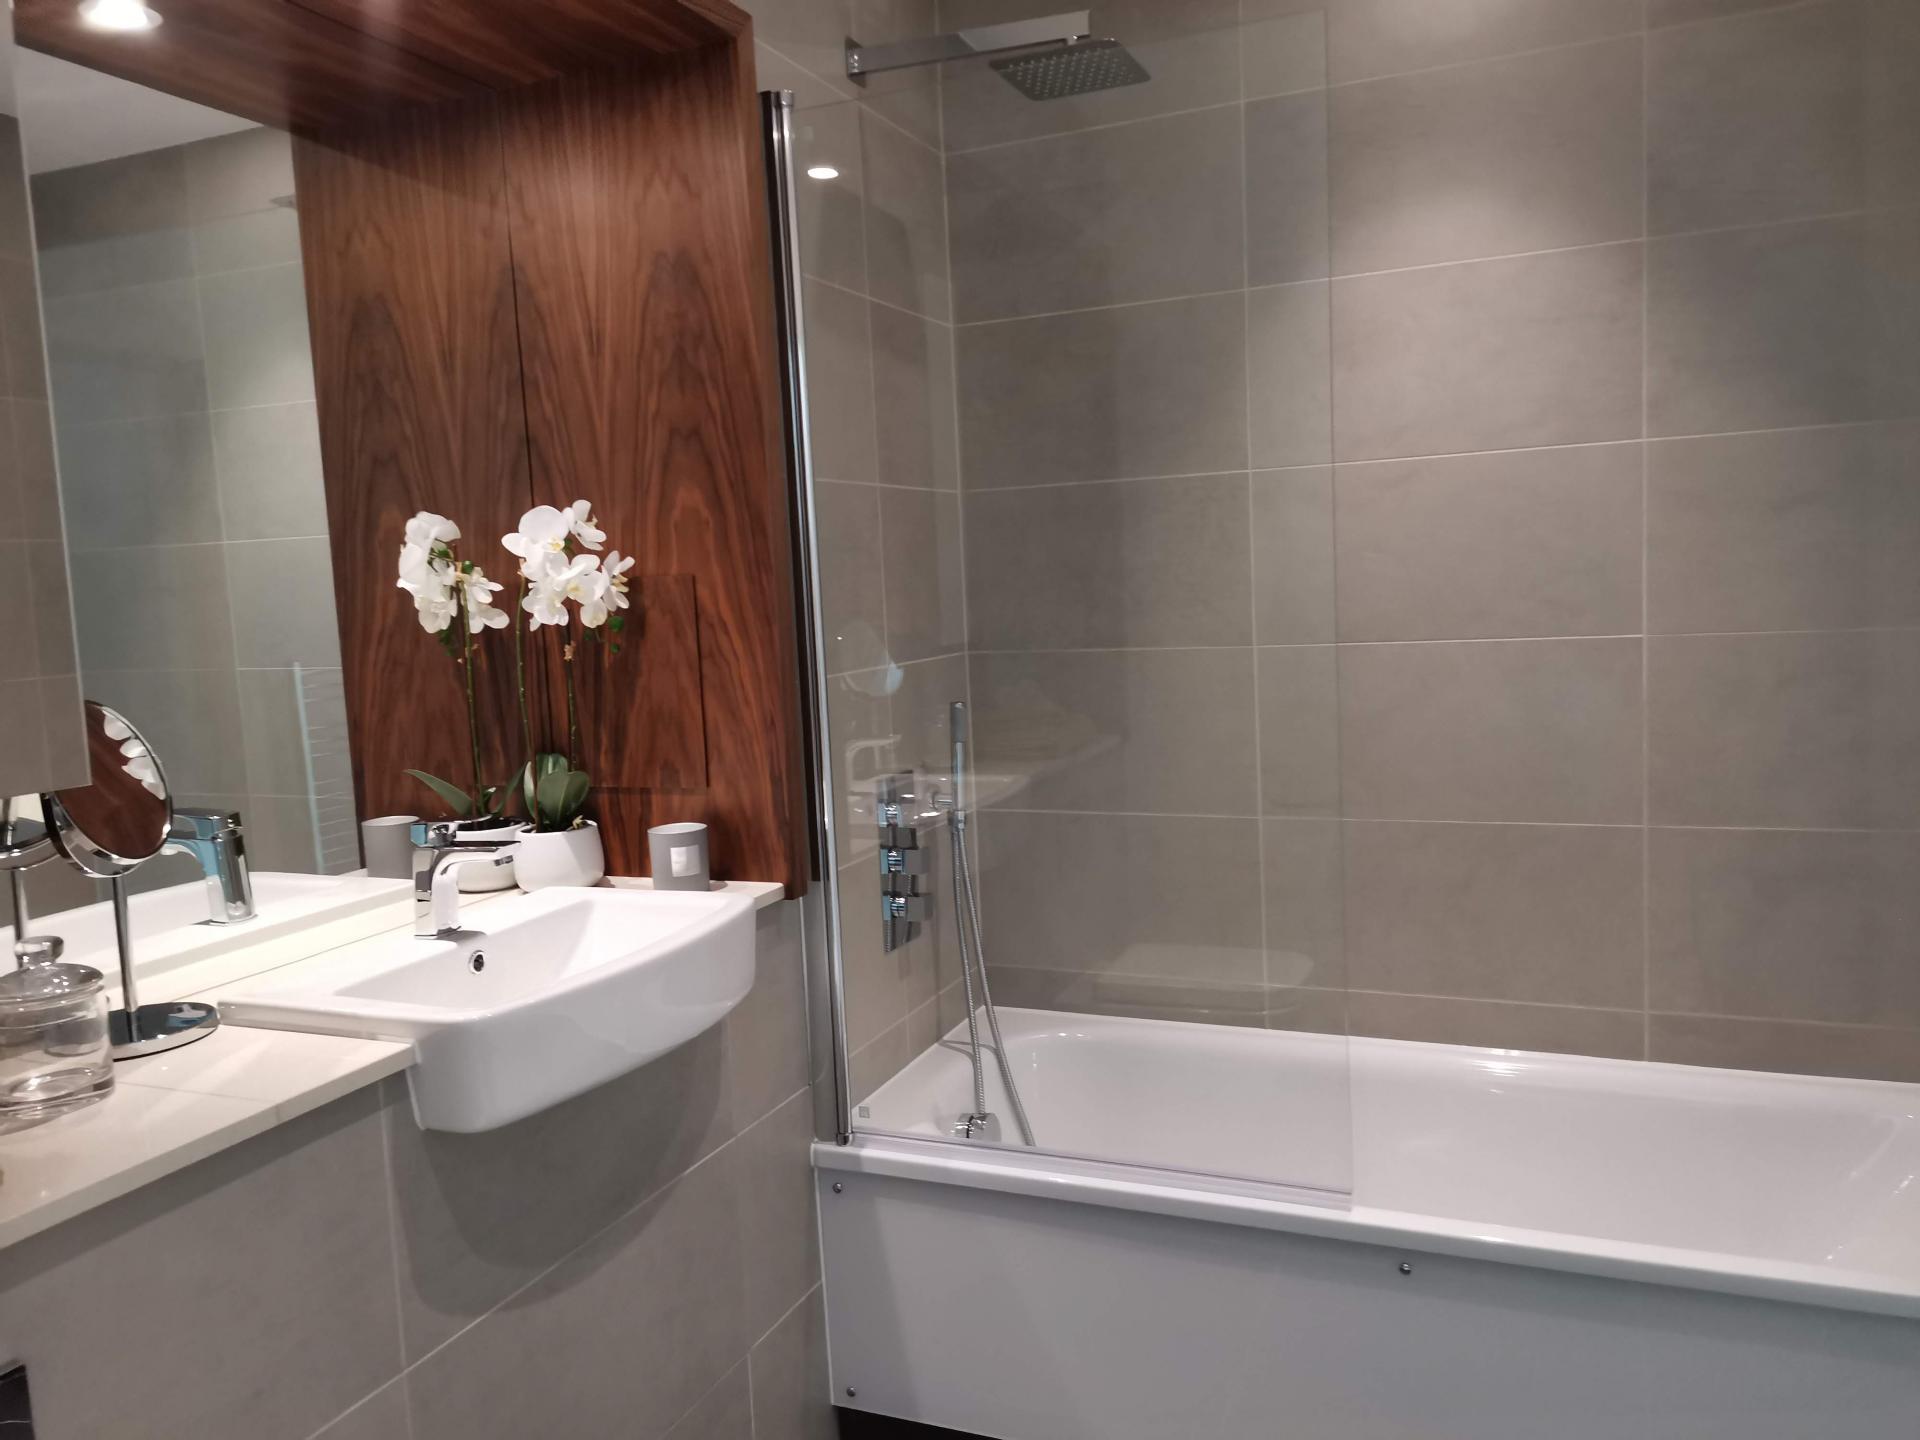 Sink at Charles Hope Canary Wharf, Canary Wharf, London - Citybase Apartments